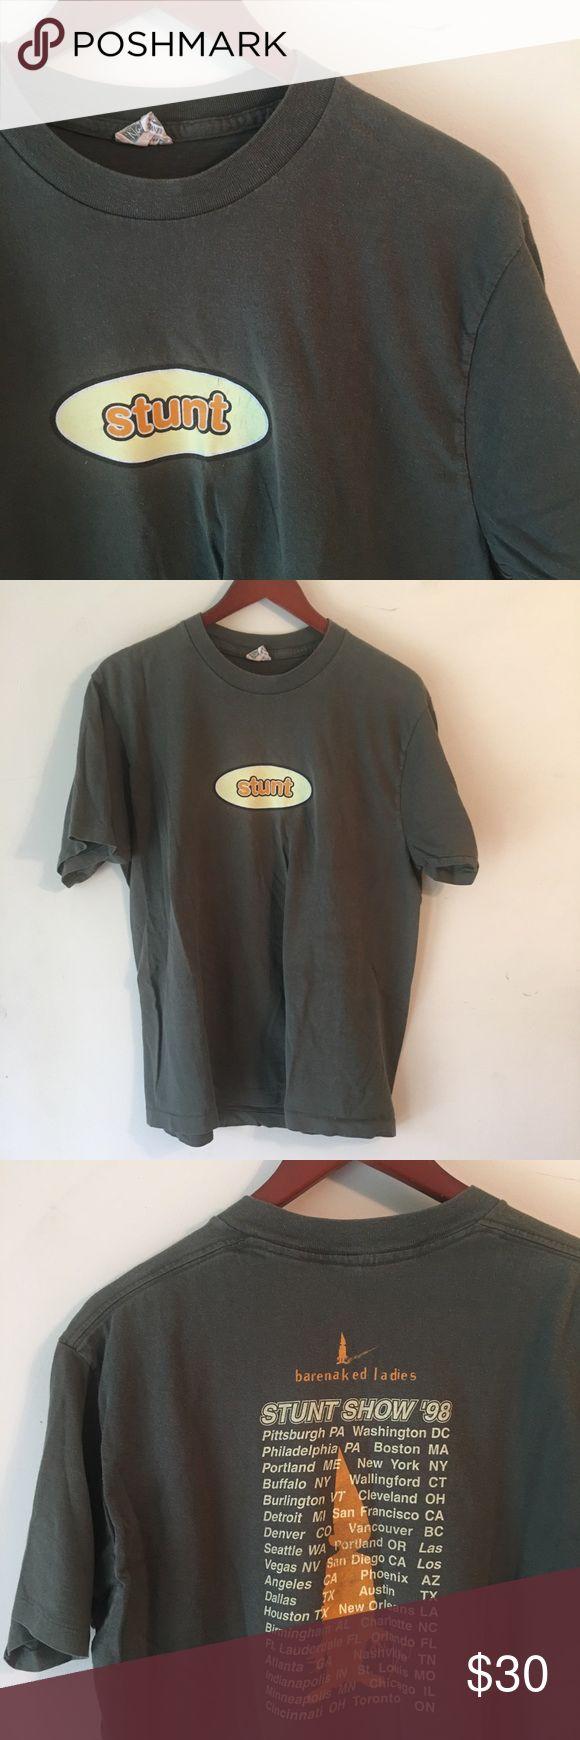 Barenaked Ladies tour t shirt From the 1998 Stun Show tour. Shirts Tees - Short Sleeve